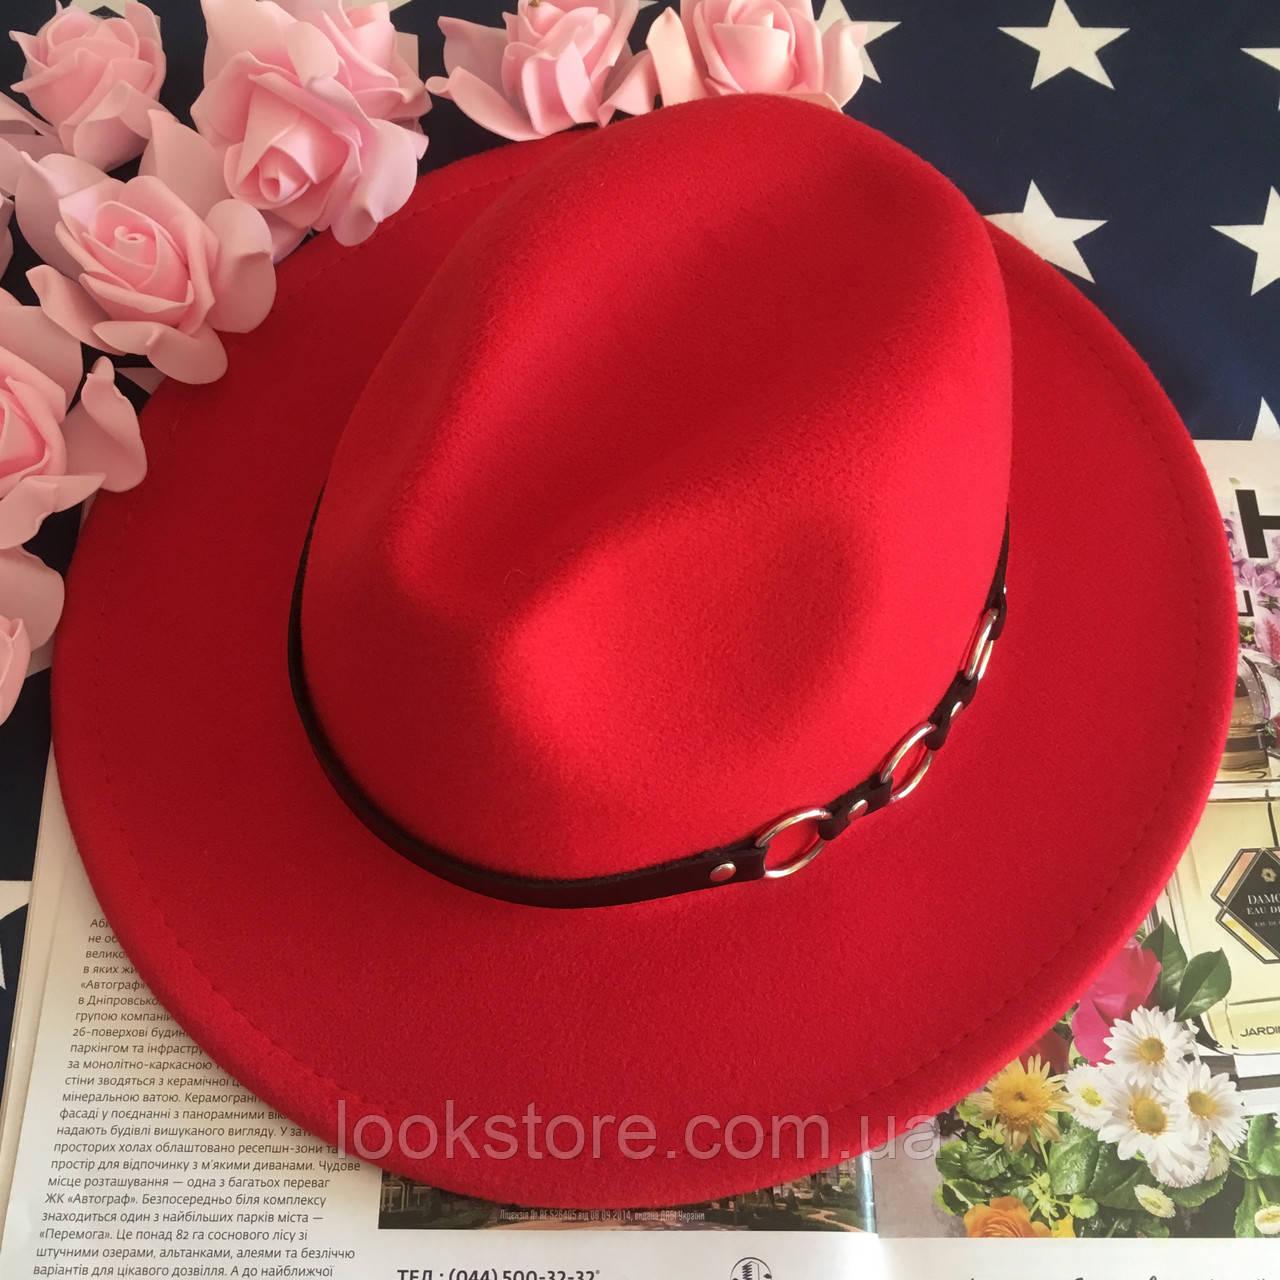 Шляпа Федора унисекс с устойчивыми полями Rings красная